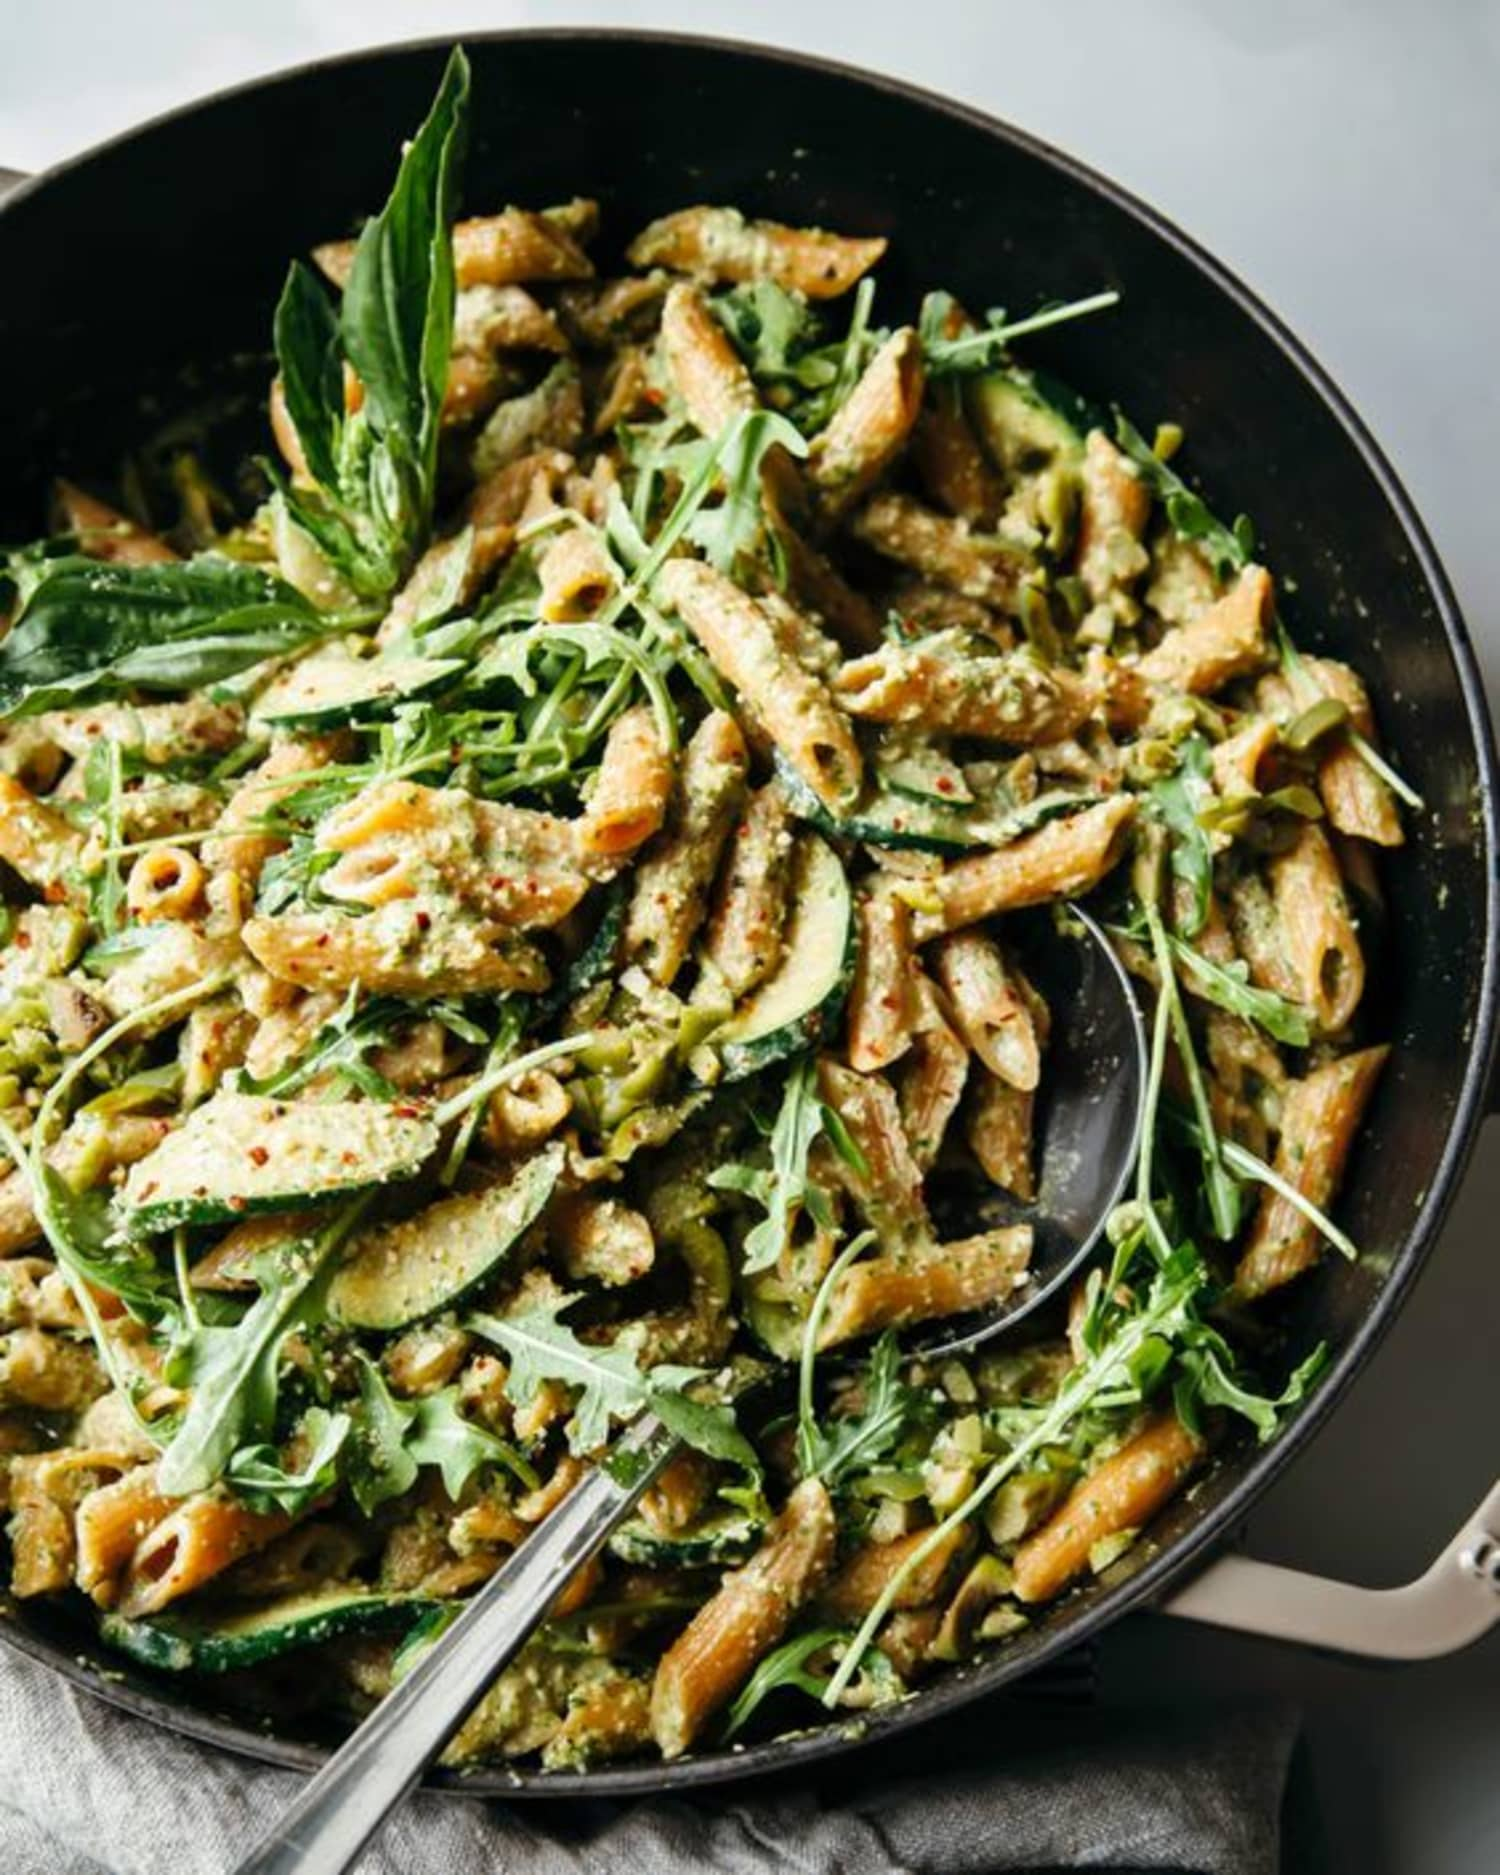 Make This Easy, Creamy Vegan Pasta for Dinner Tonight